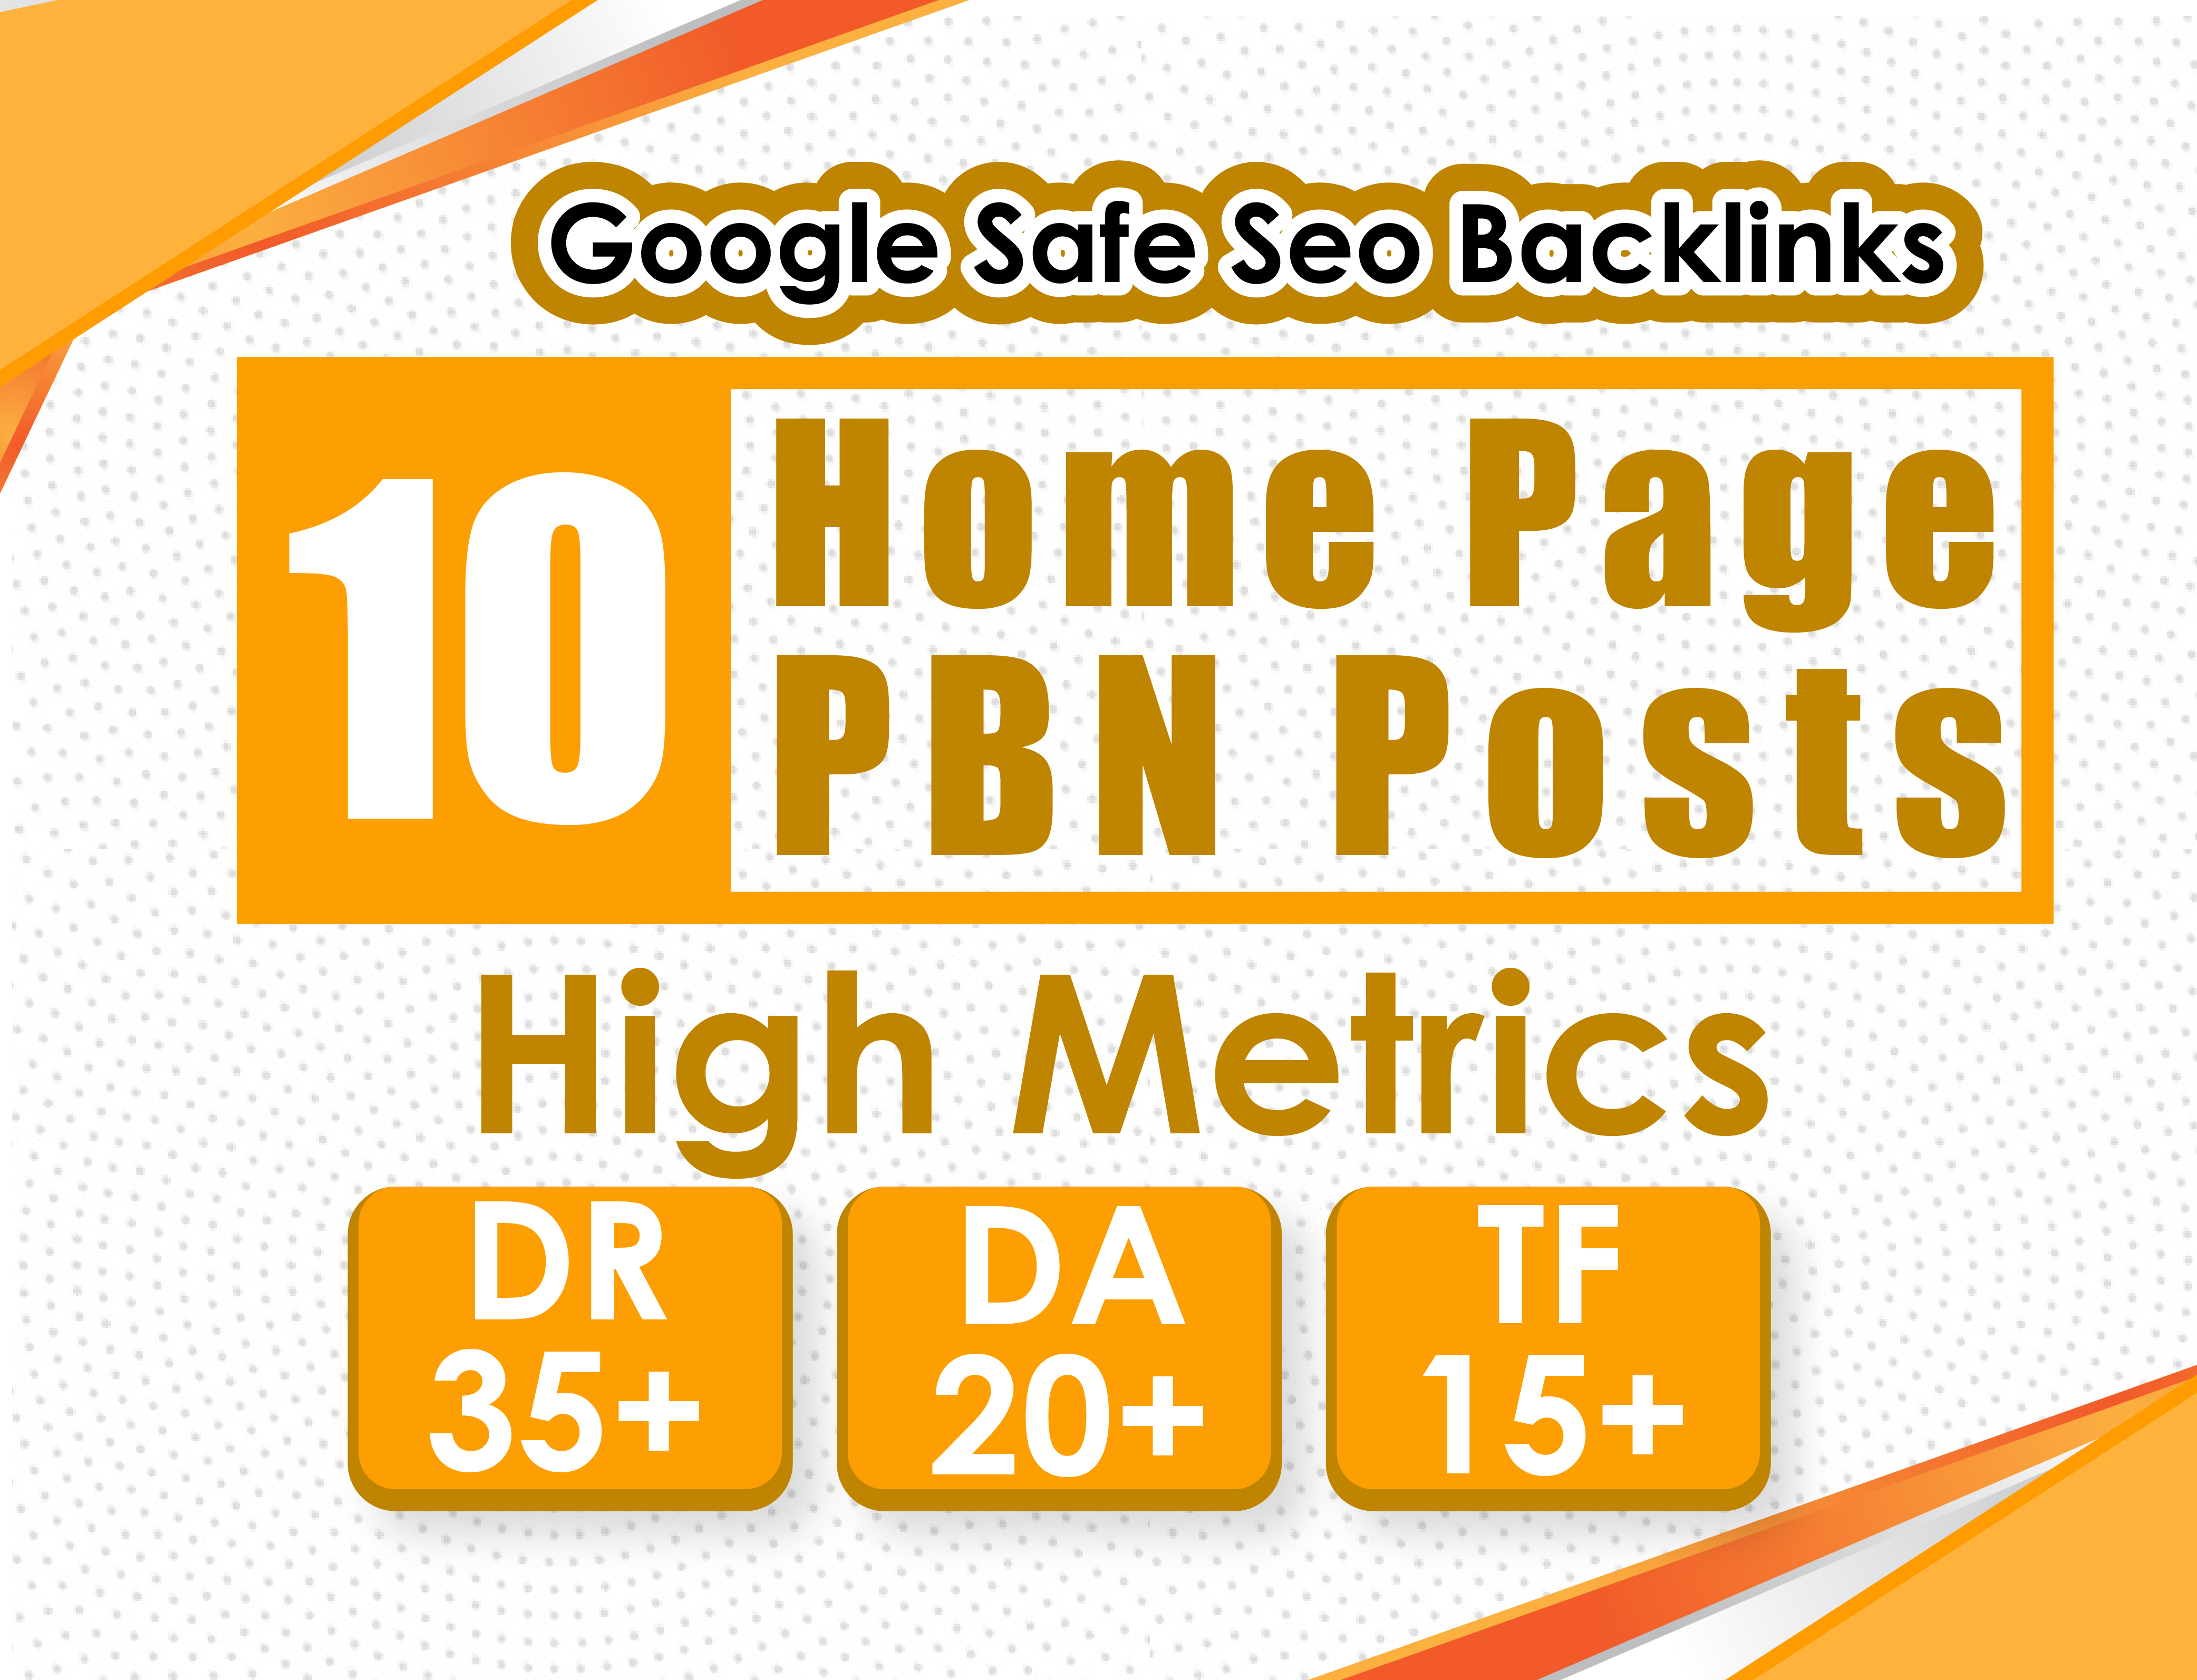 Build 10 High PA DA TF CF HomePage PBN Backlinks